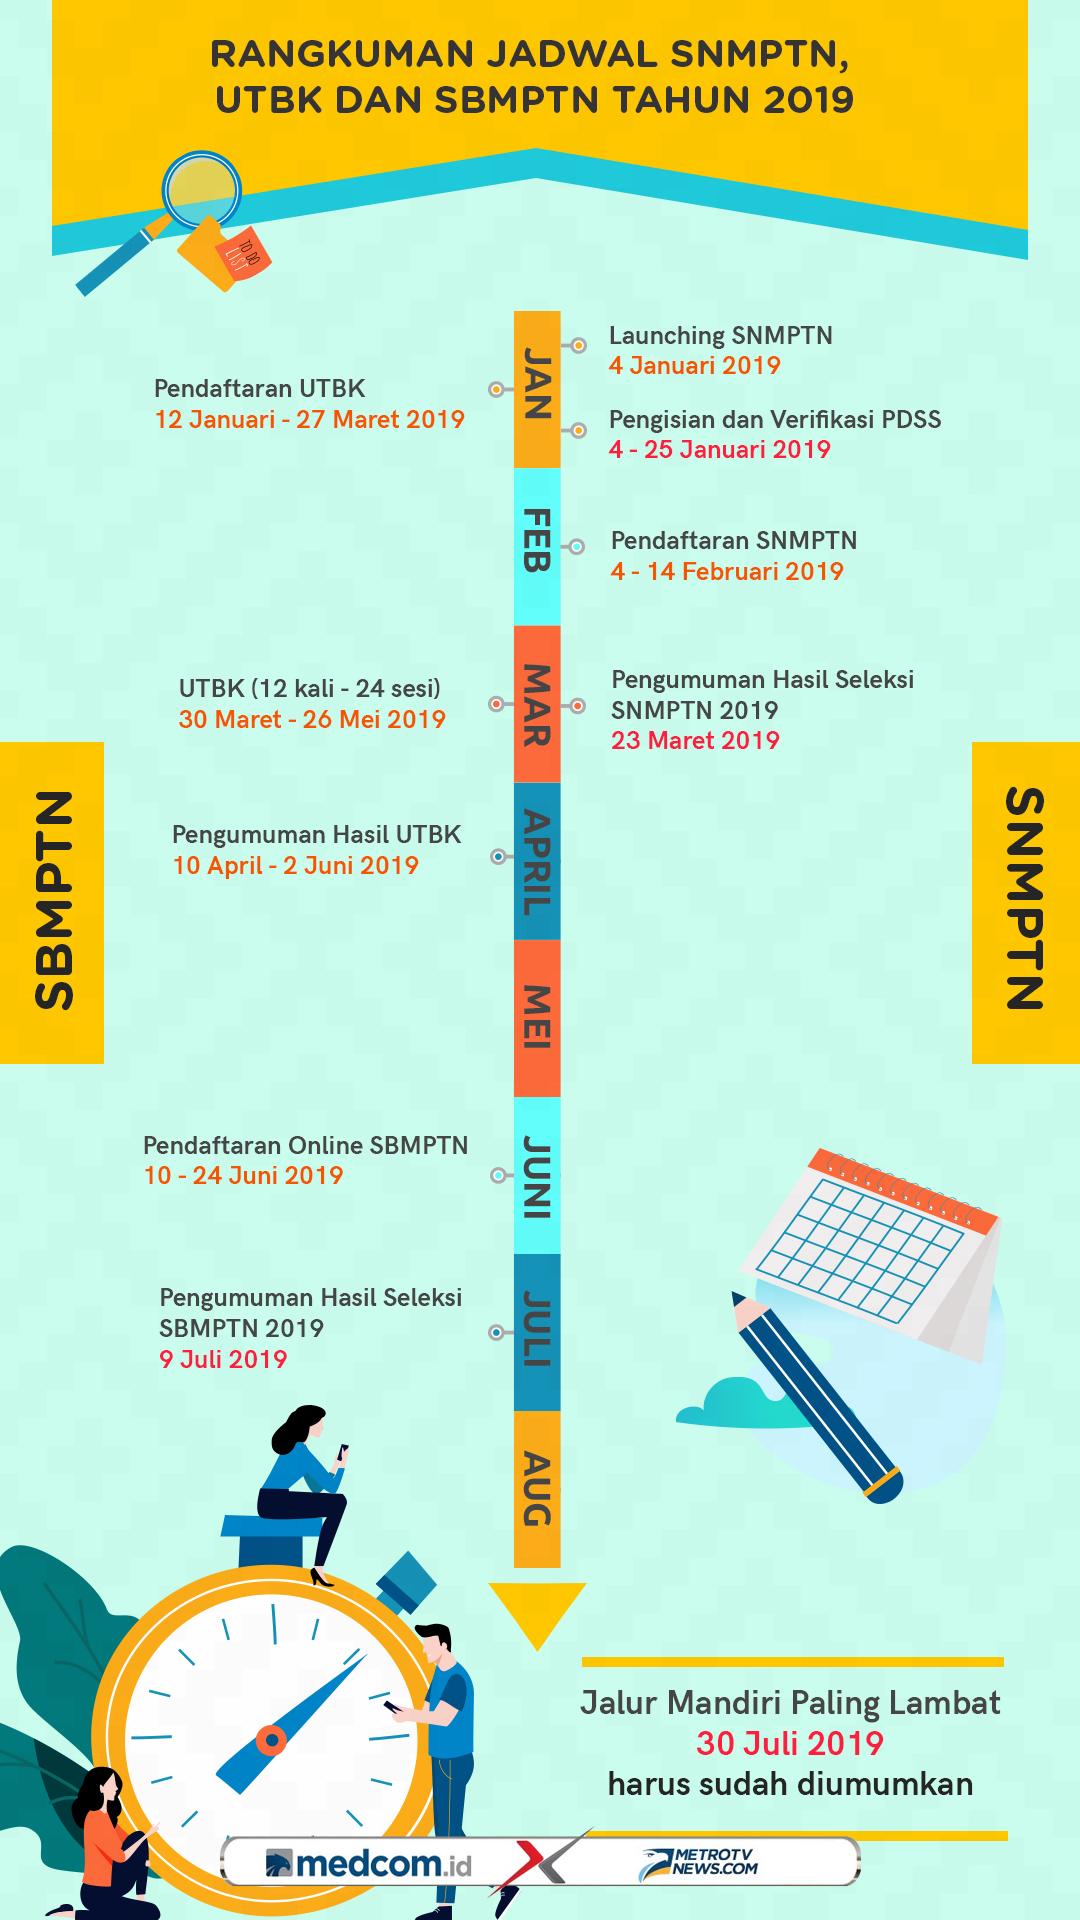 Jadwal SNMPTN, UTBK dan SBMPTN Tahun 2019